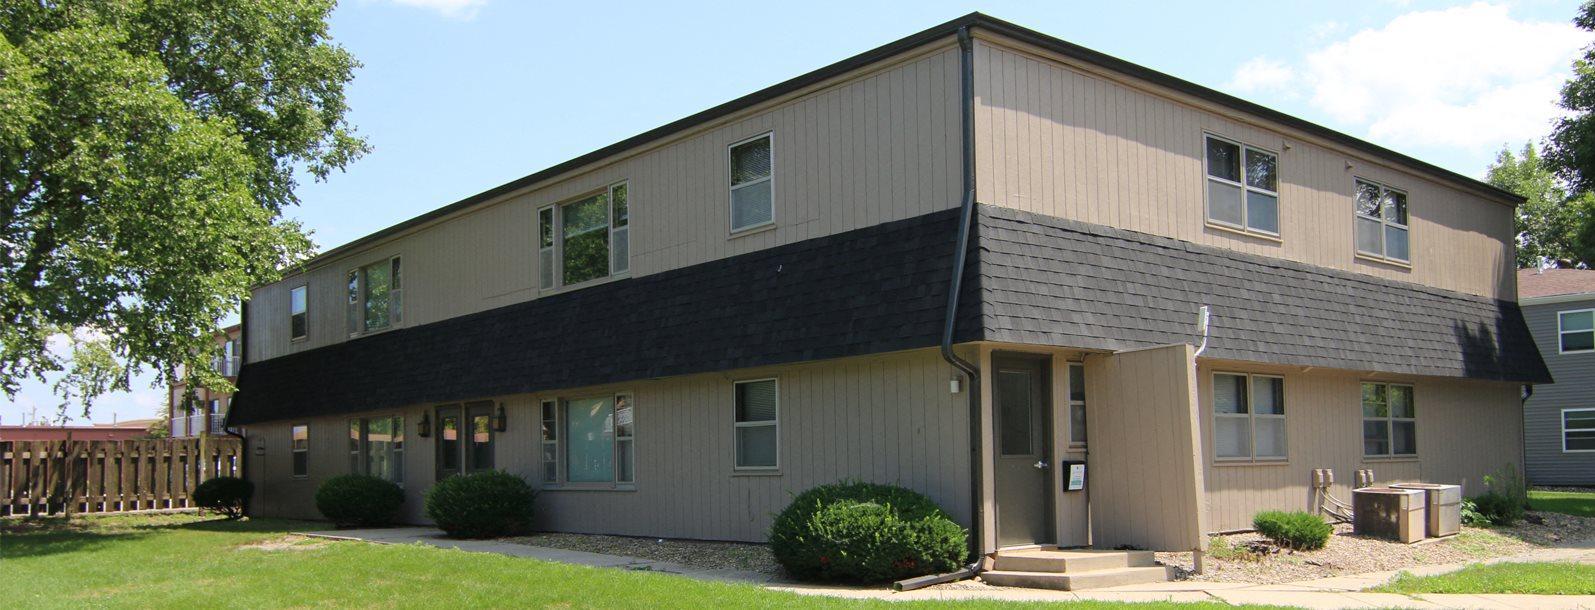 South-View-Apartments-Ames-Iowa-exterior-courtyard